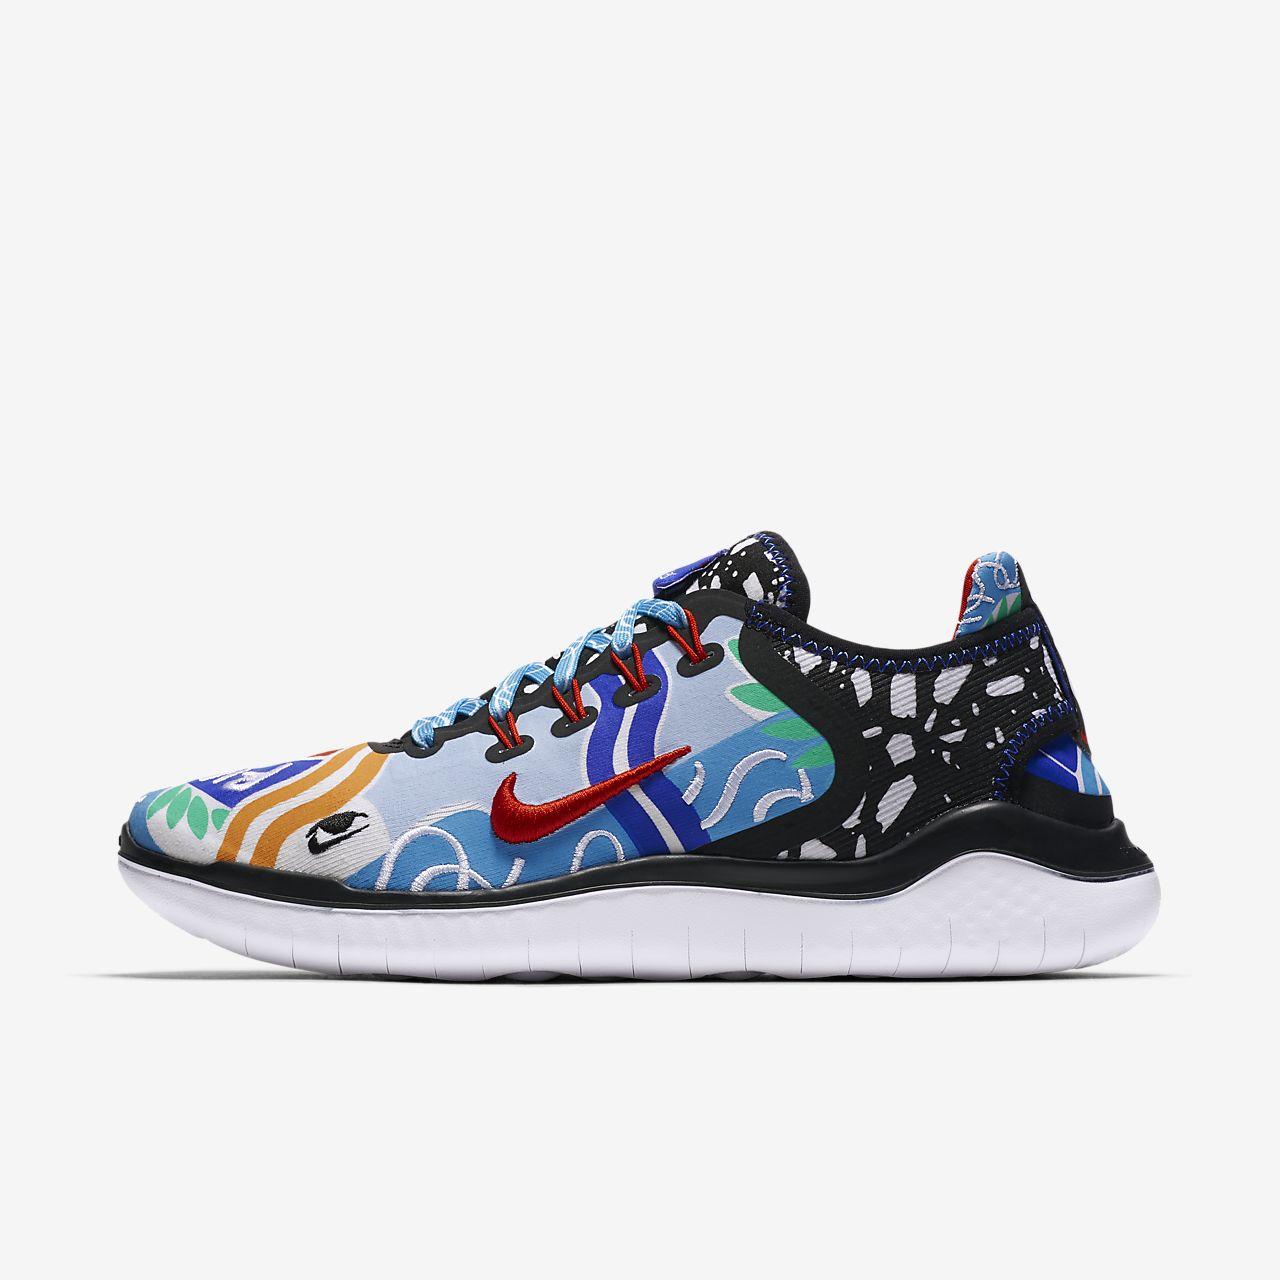 Nike Kyrie 4 BIANCO profonda blu reale Uomo Scarpe da Ginnastica tutte le misure